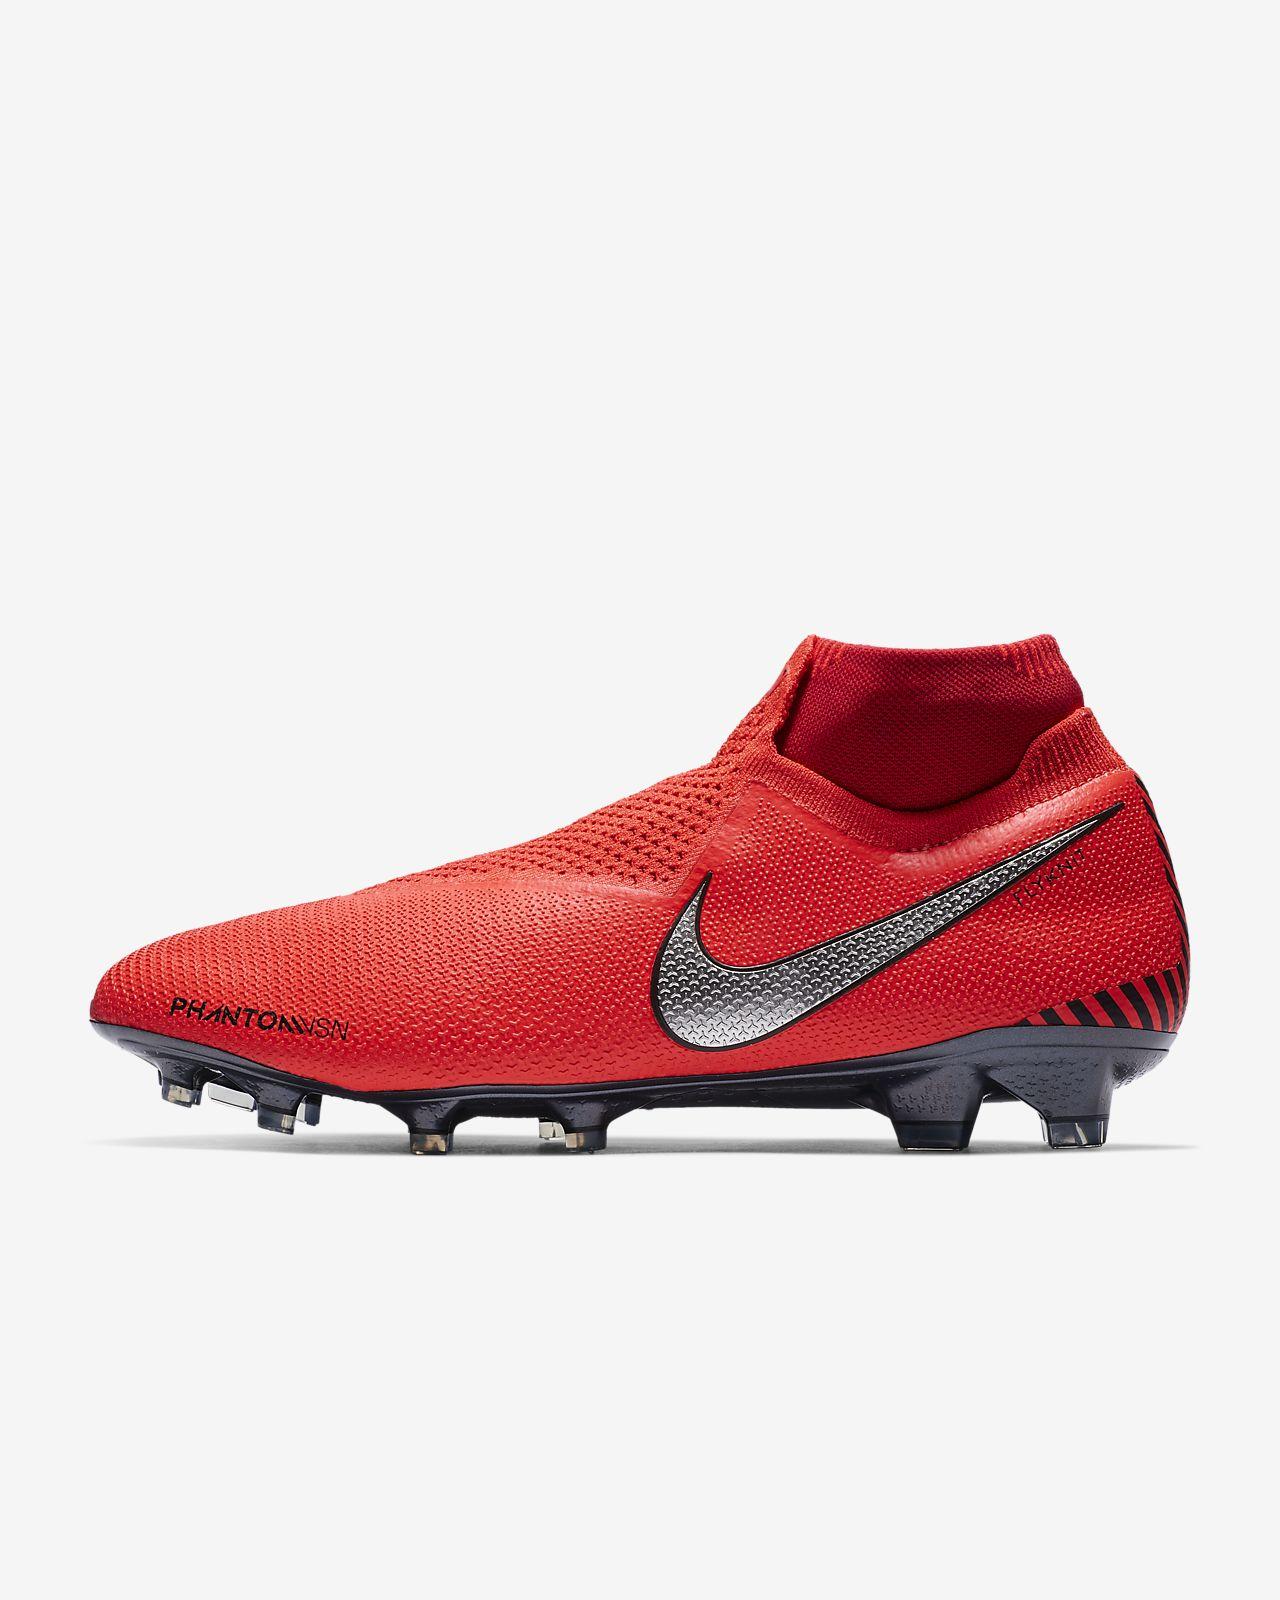 half off e760c 502a1 ... Chaussure de football à crampons pour terrain sec Nike PhantomVSN  Vision Elite Dynamic Fit Game Over